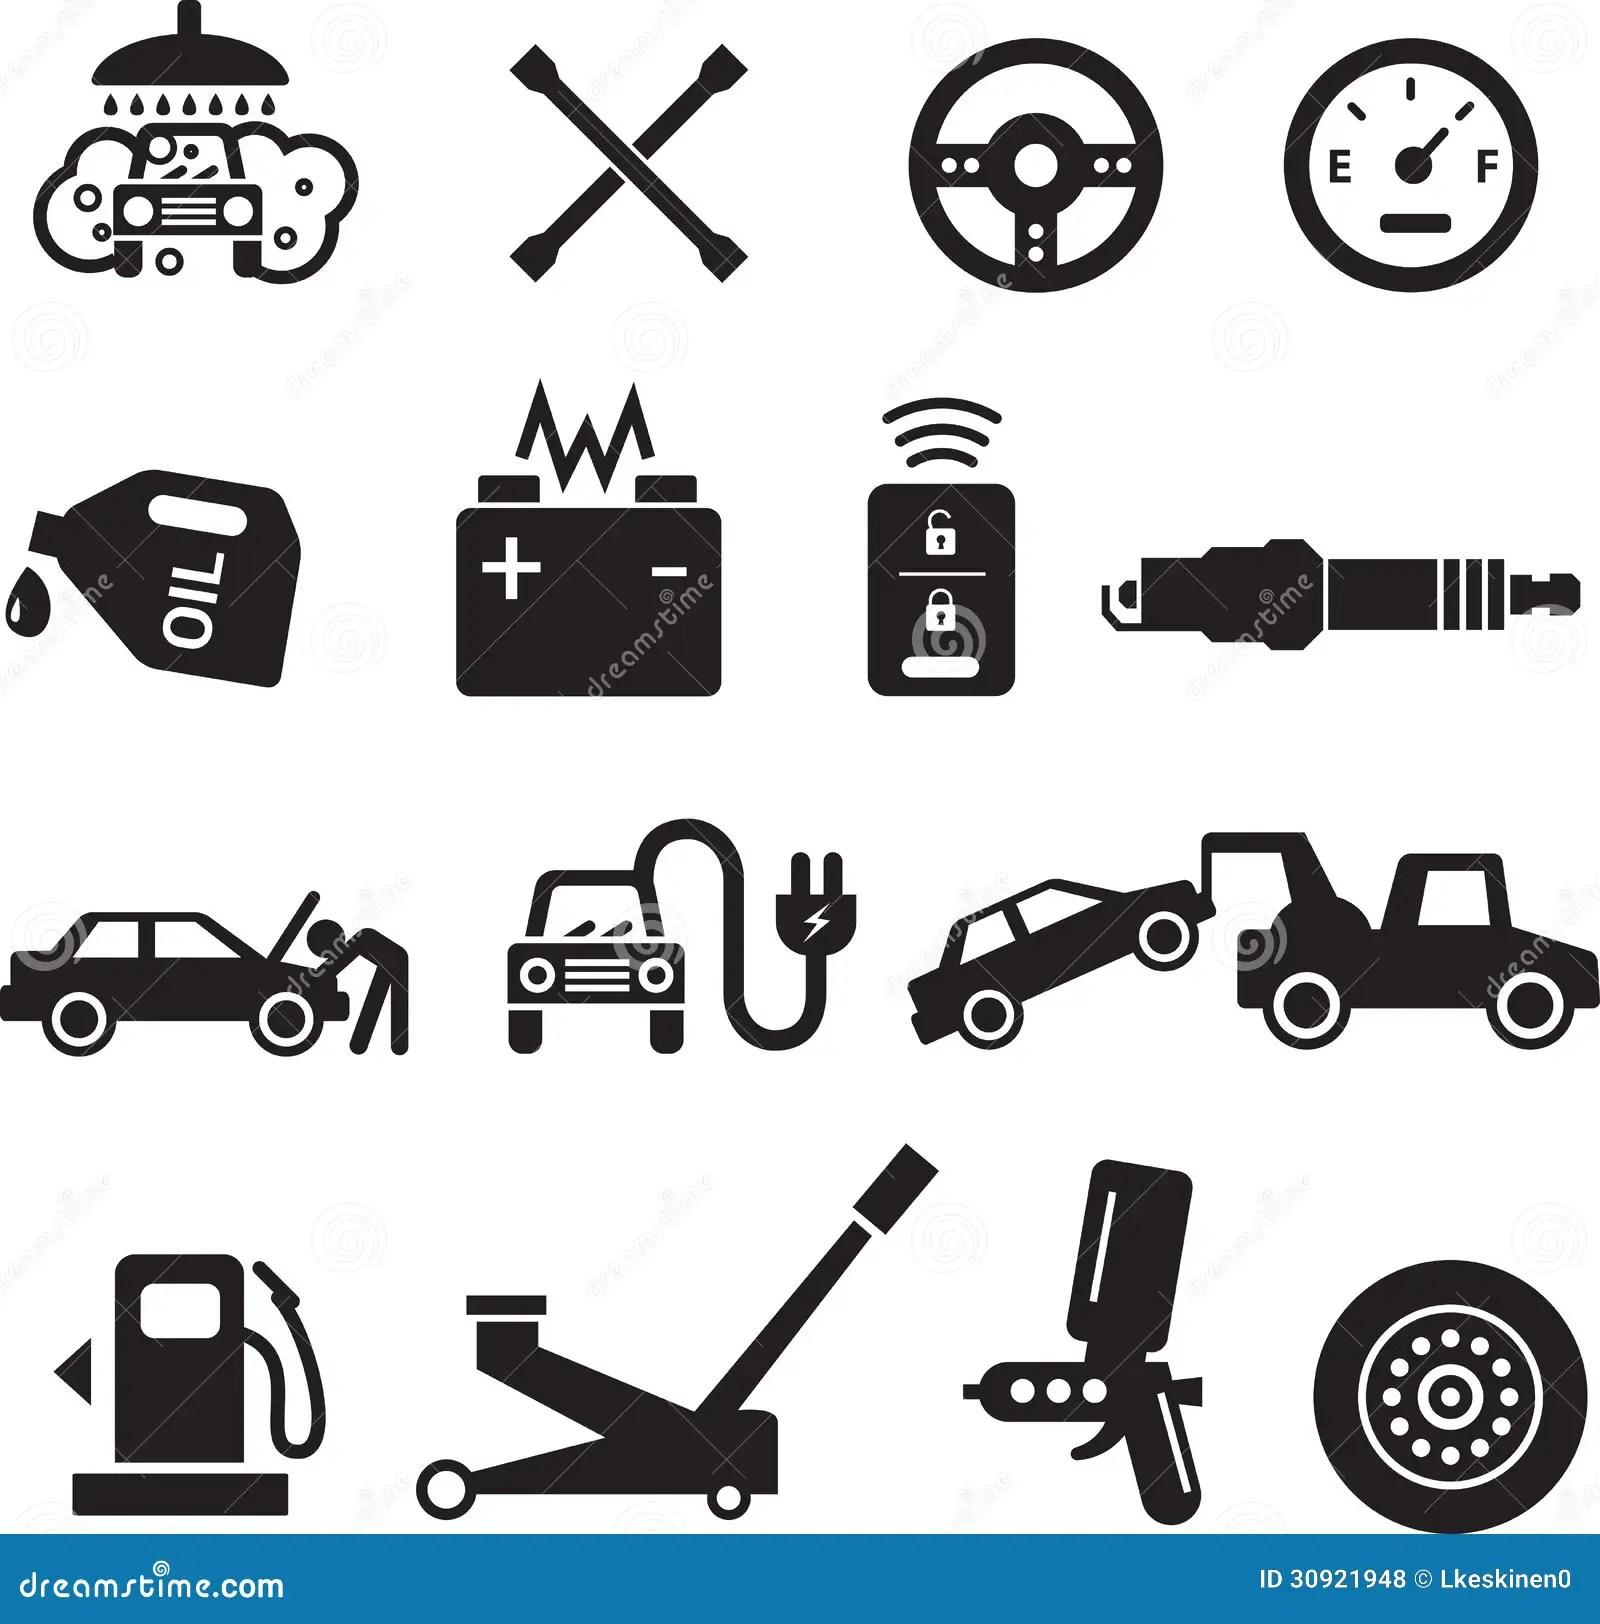 Car Service Icons Royalty Free Stock Photos